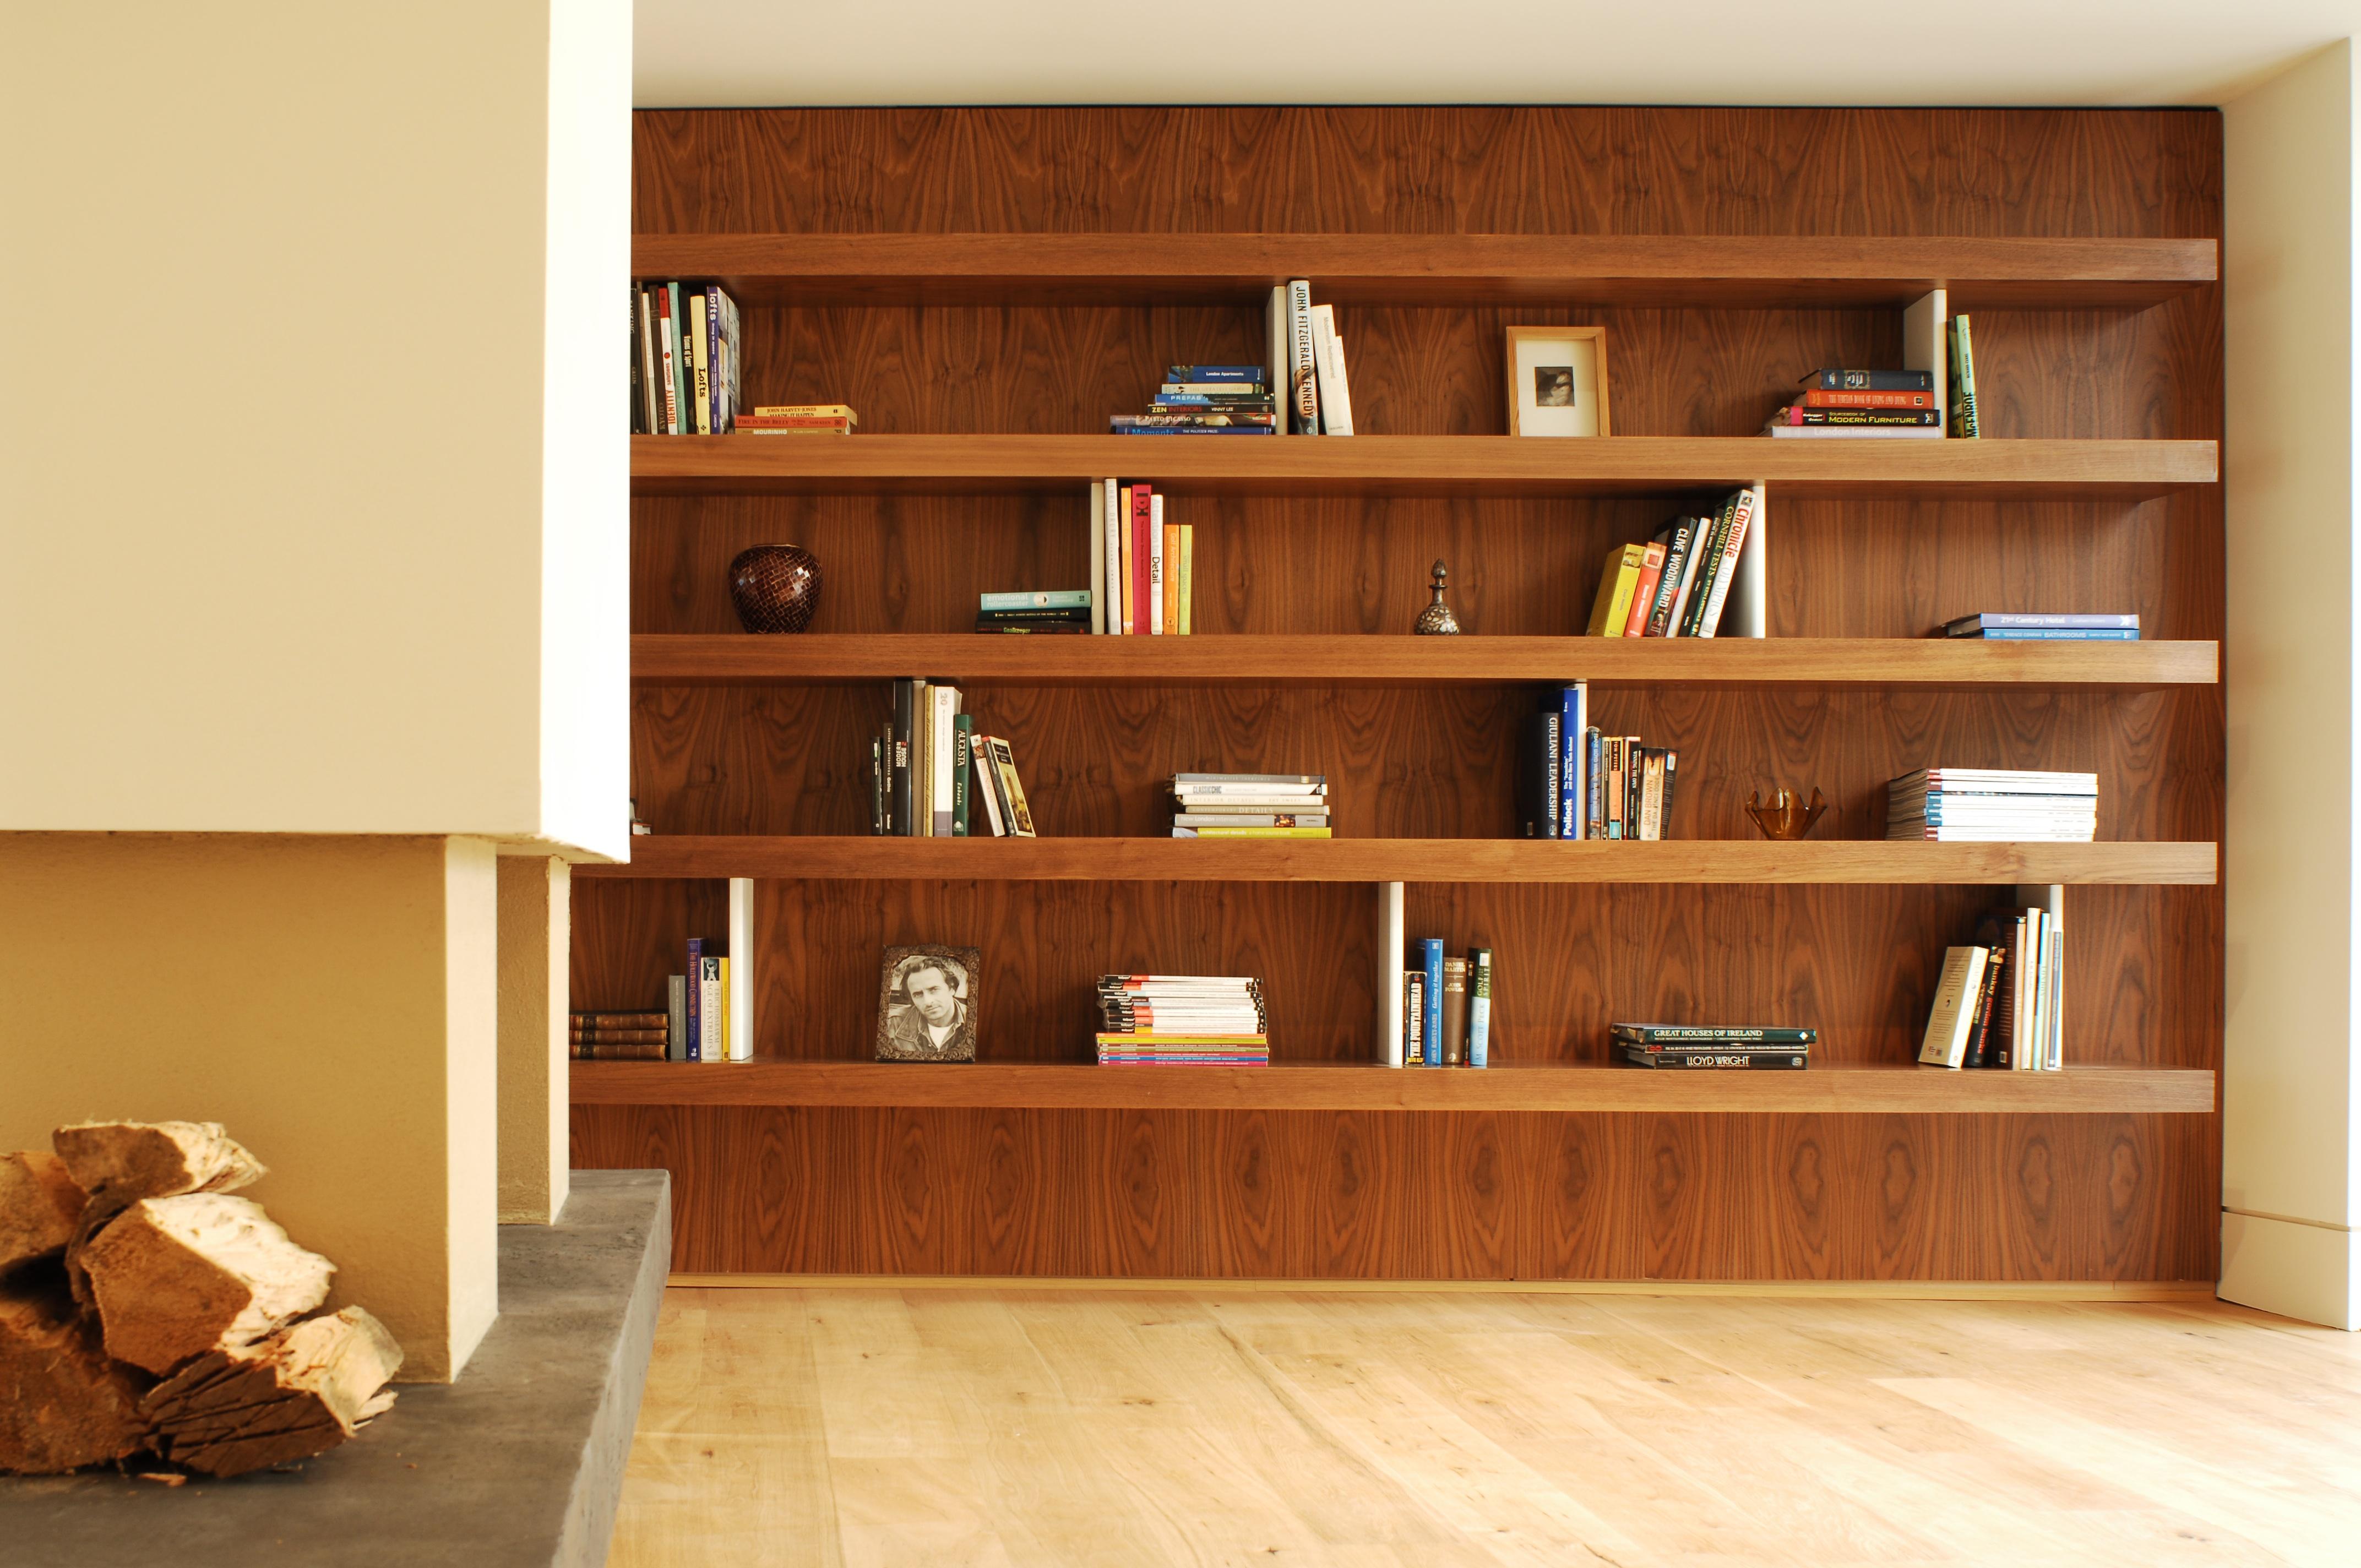 Walnut Wall panels & Shelves